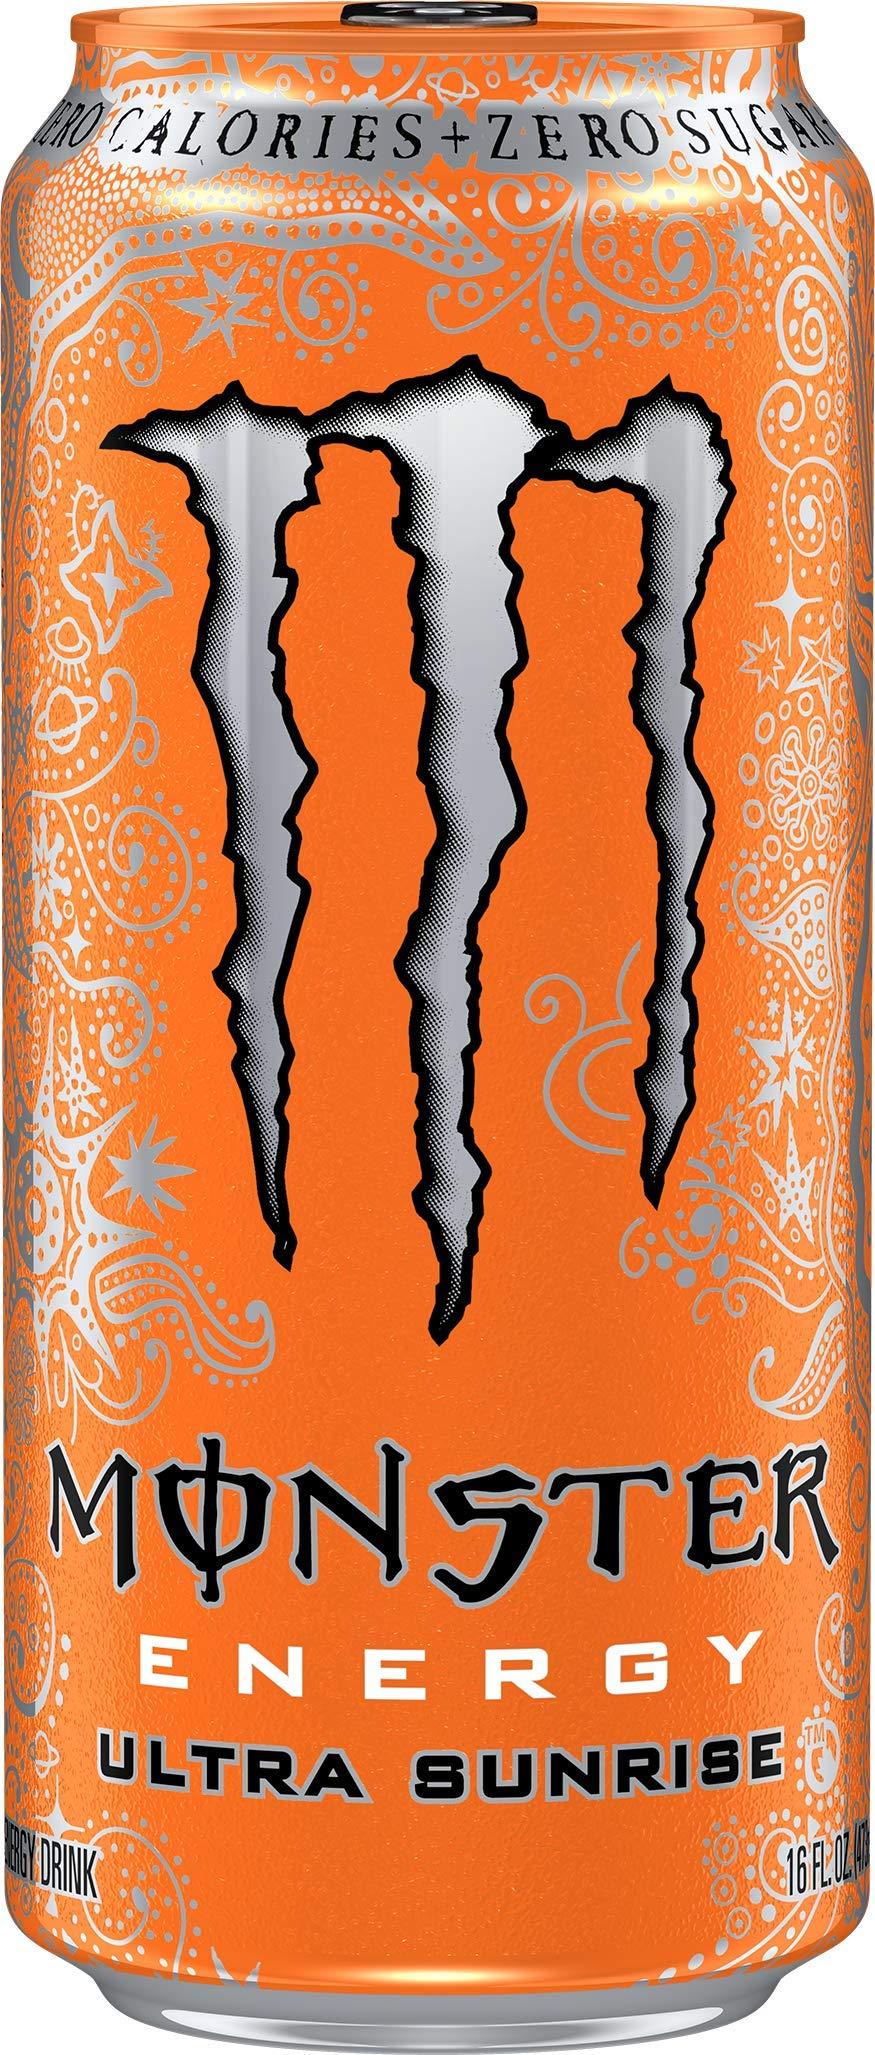 Monster Energy Ultra Sunrise, Sugar Free Energy Drink, 16 Ounce (Pack of 24) by Monster Energy (Image #3)